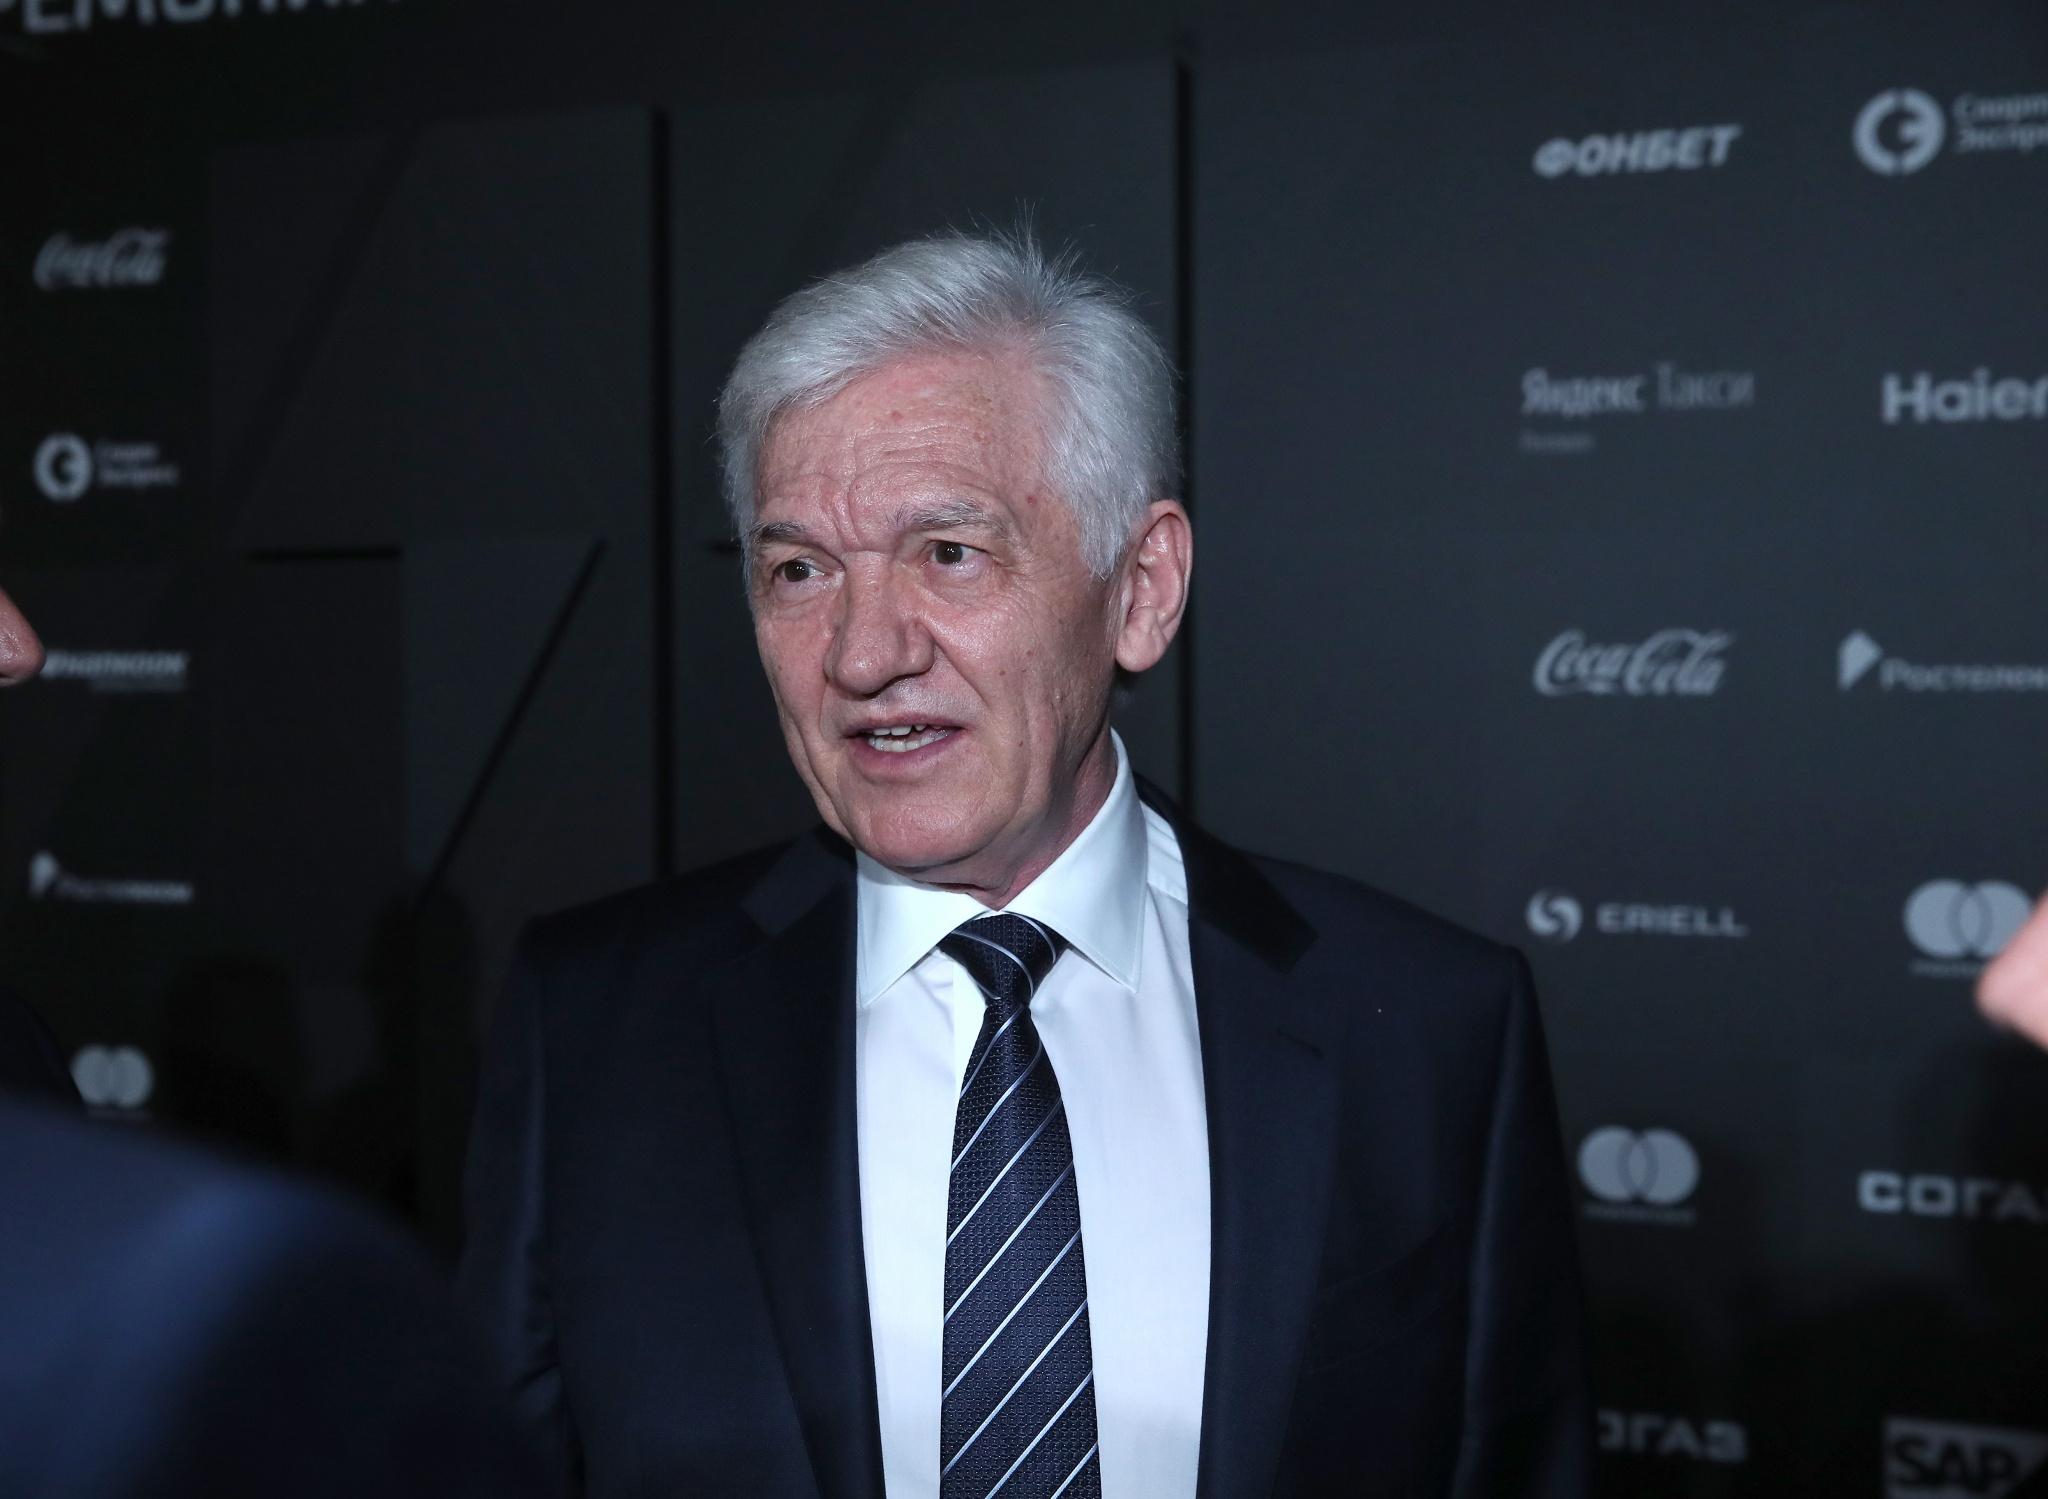 Геннадий Тимченко. Фото: Владимир Беззубов